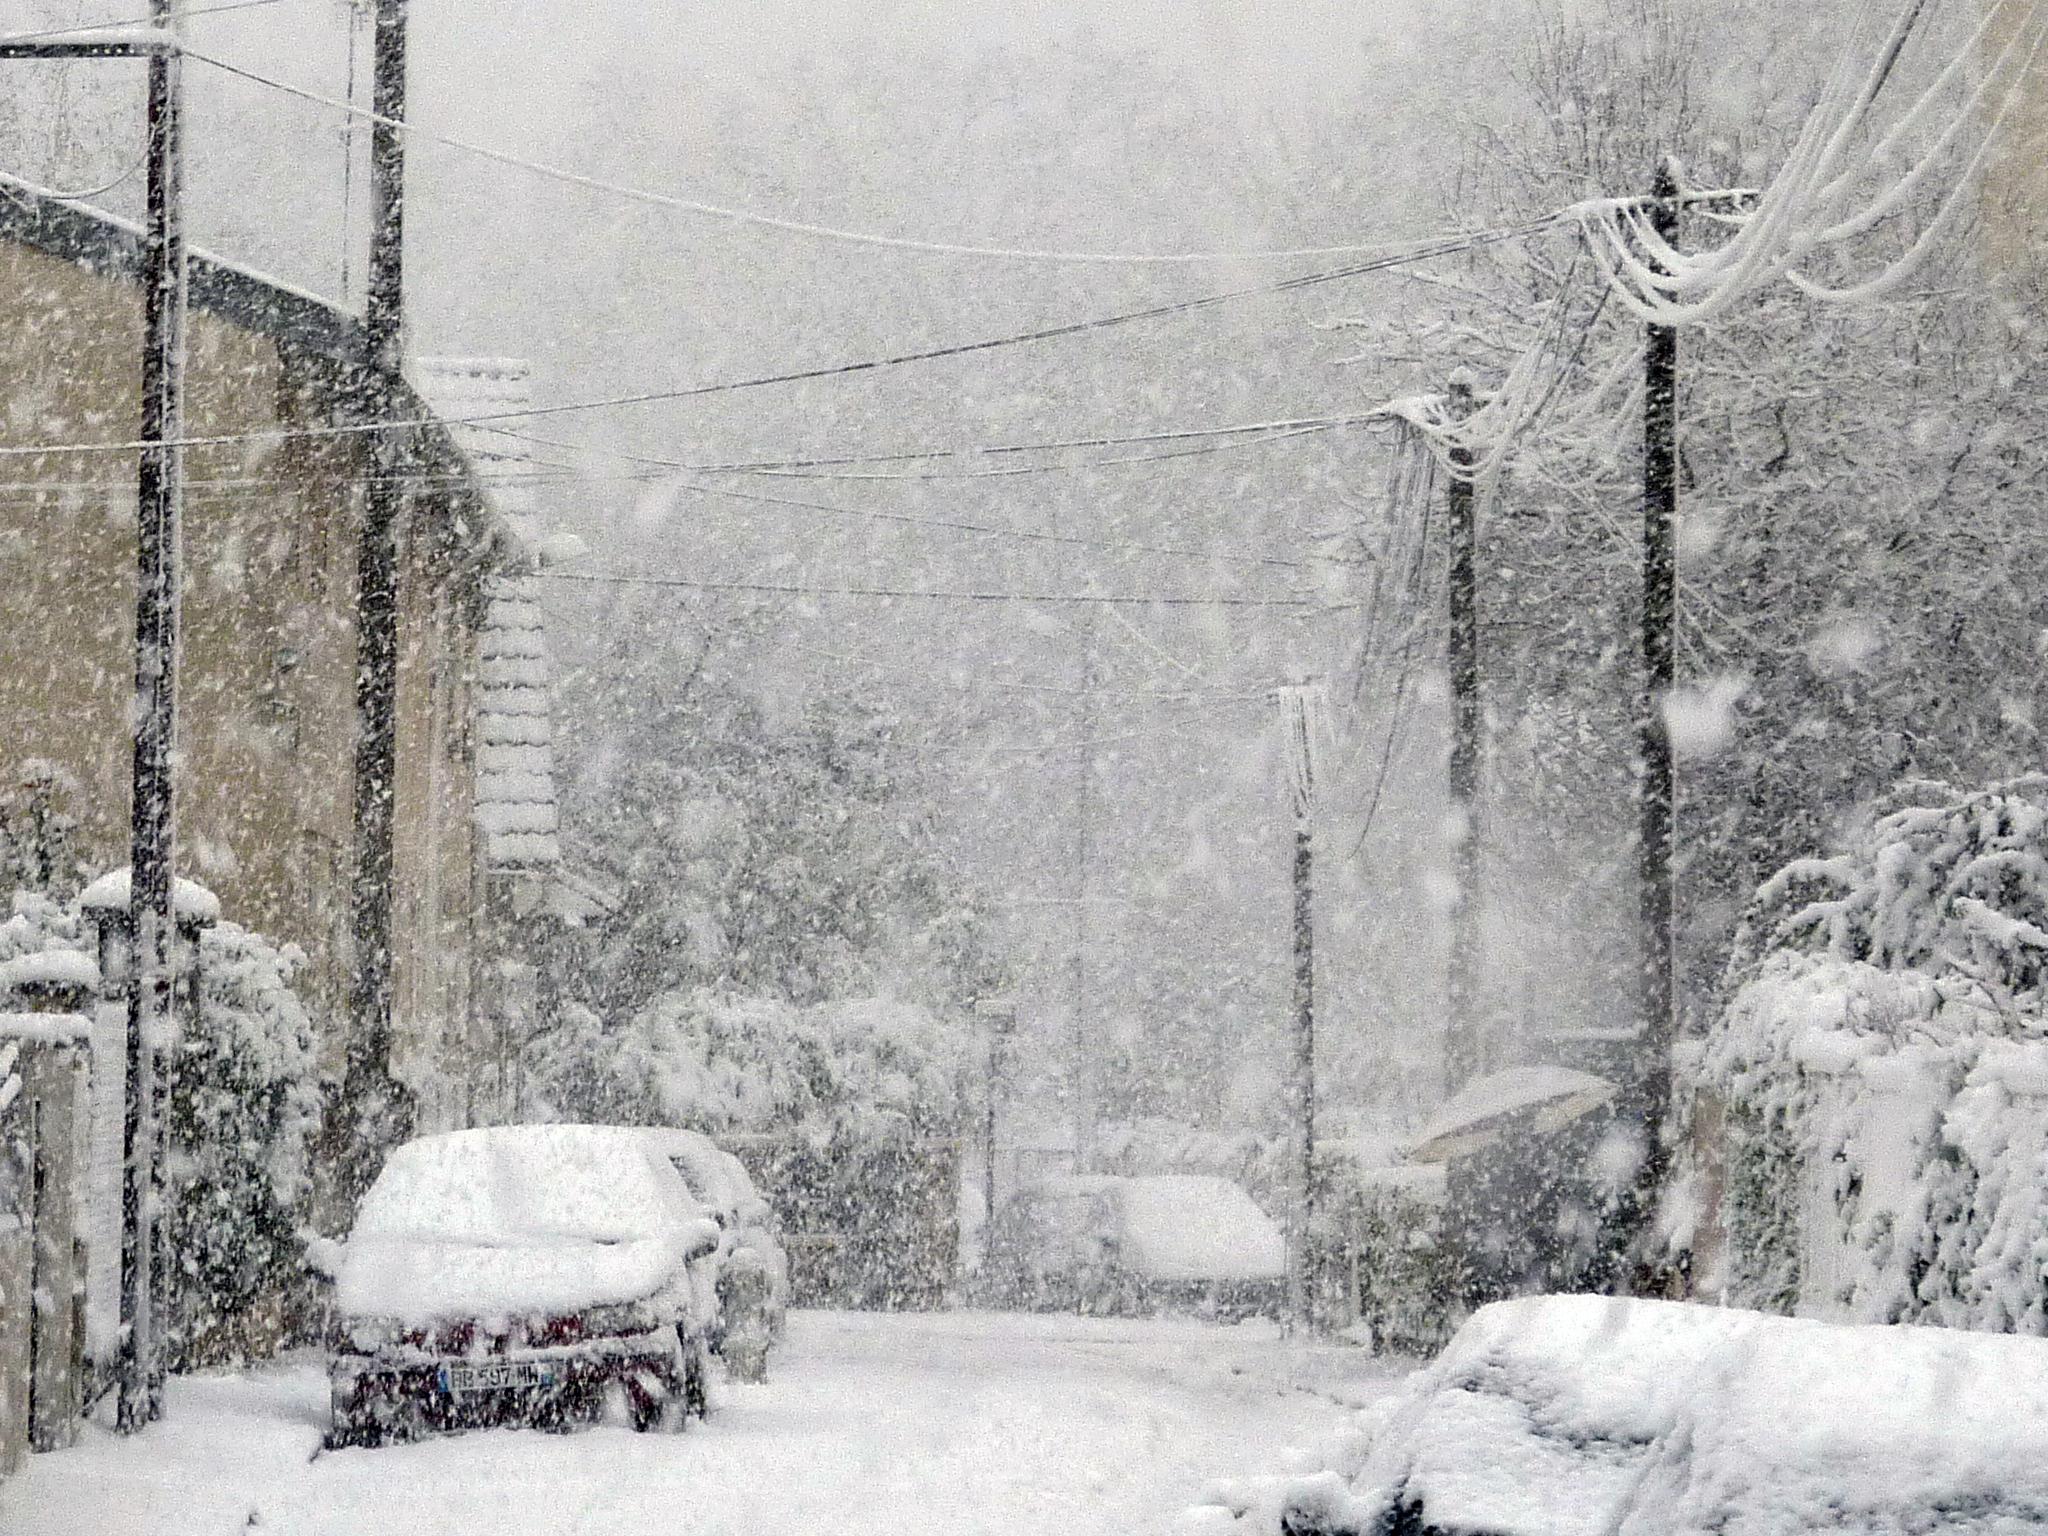 Cmp Livry Gargan destiné file:neige à livry-gargan - wikimedia commons